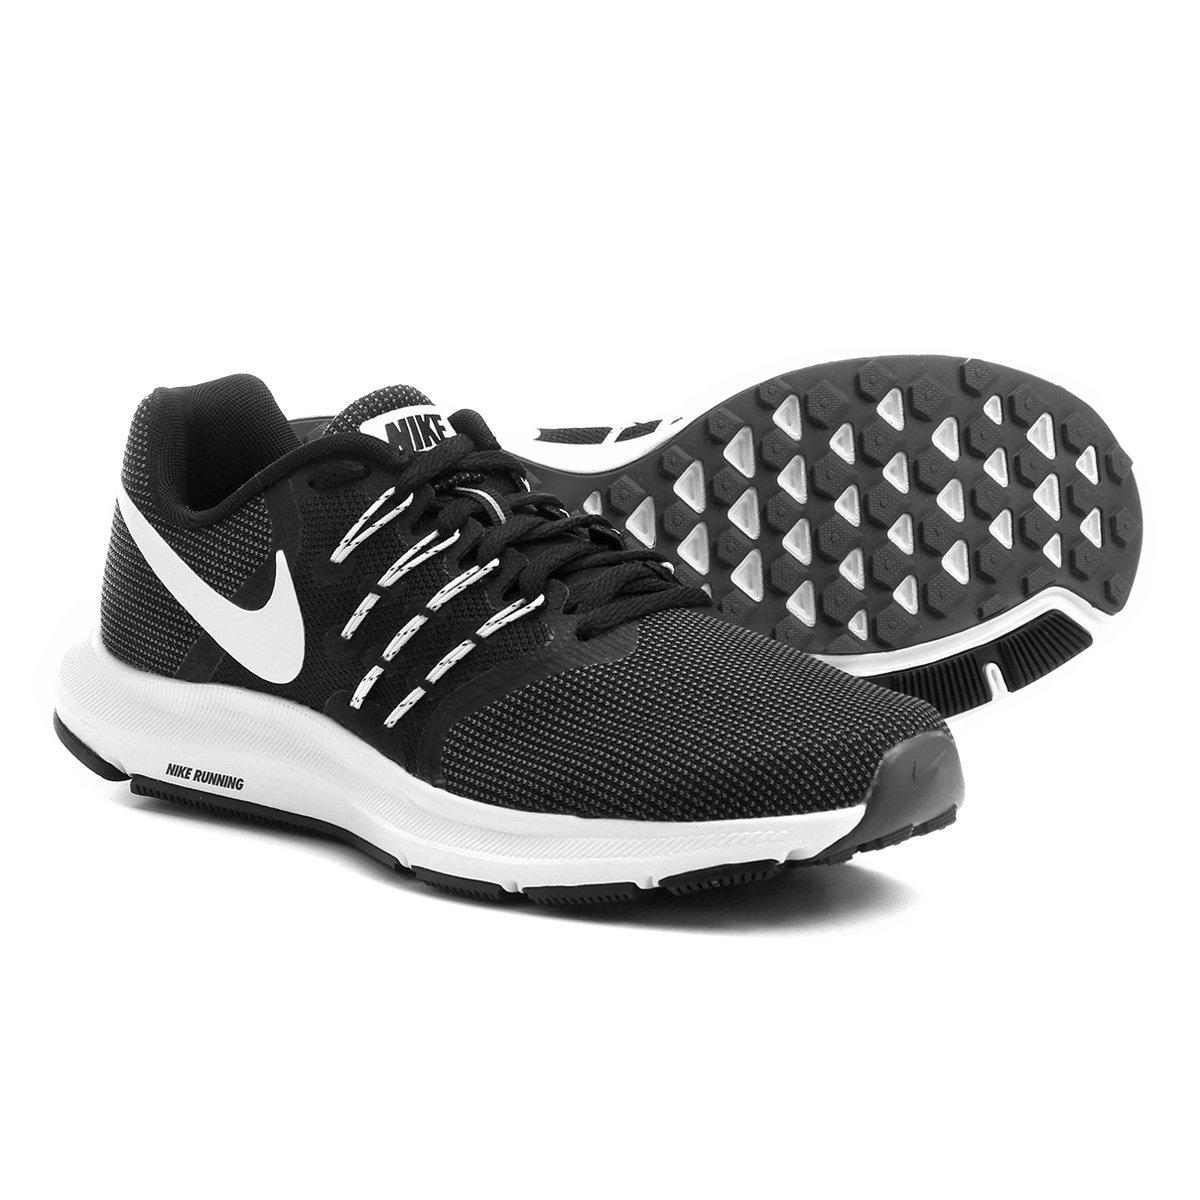 8e782769335 Tênis Nike Run Swift Feminino - Compre Agora